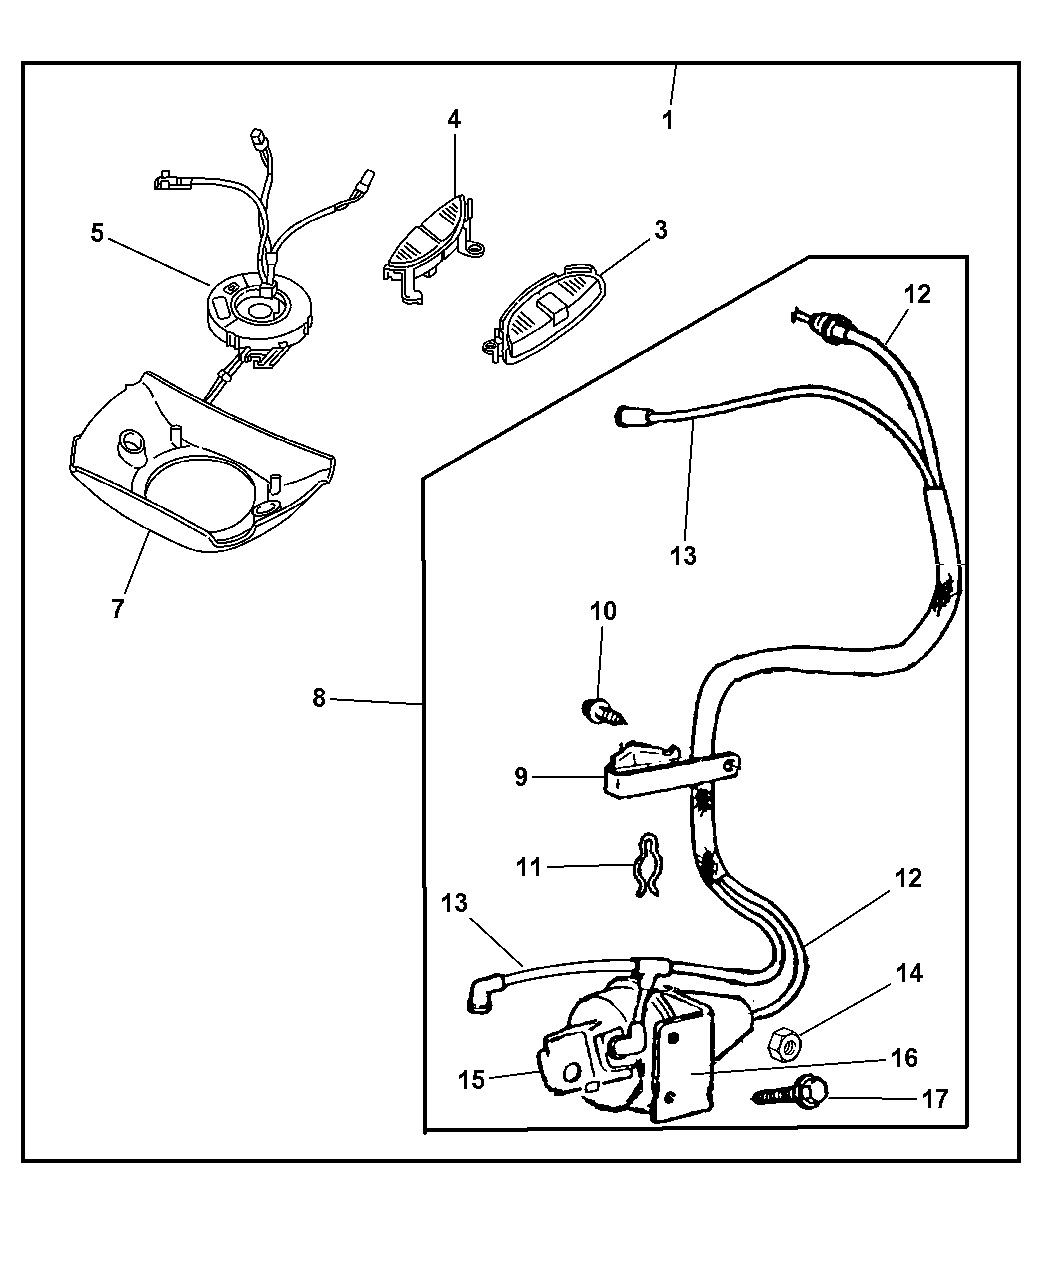 2002 Dodge Ram Van Control Package - Speed